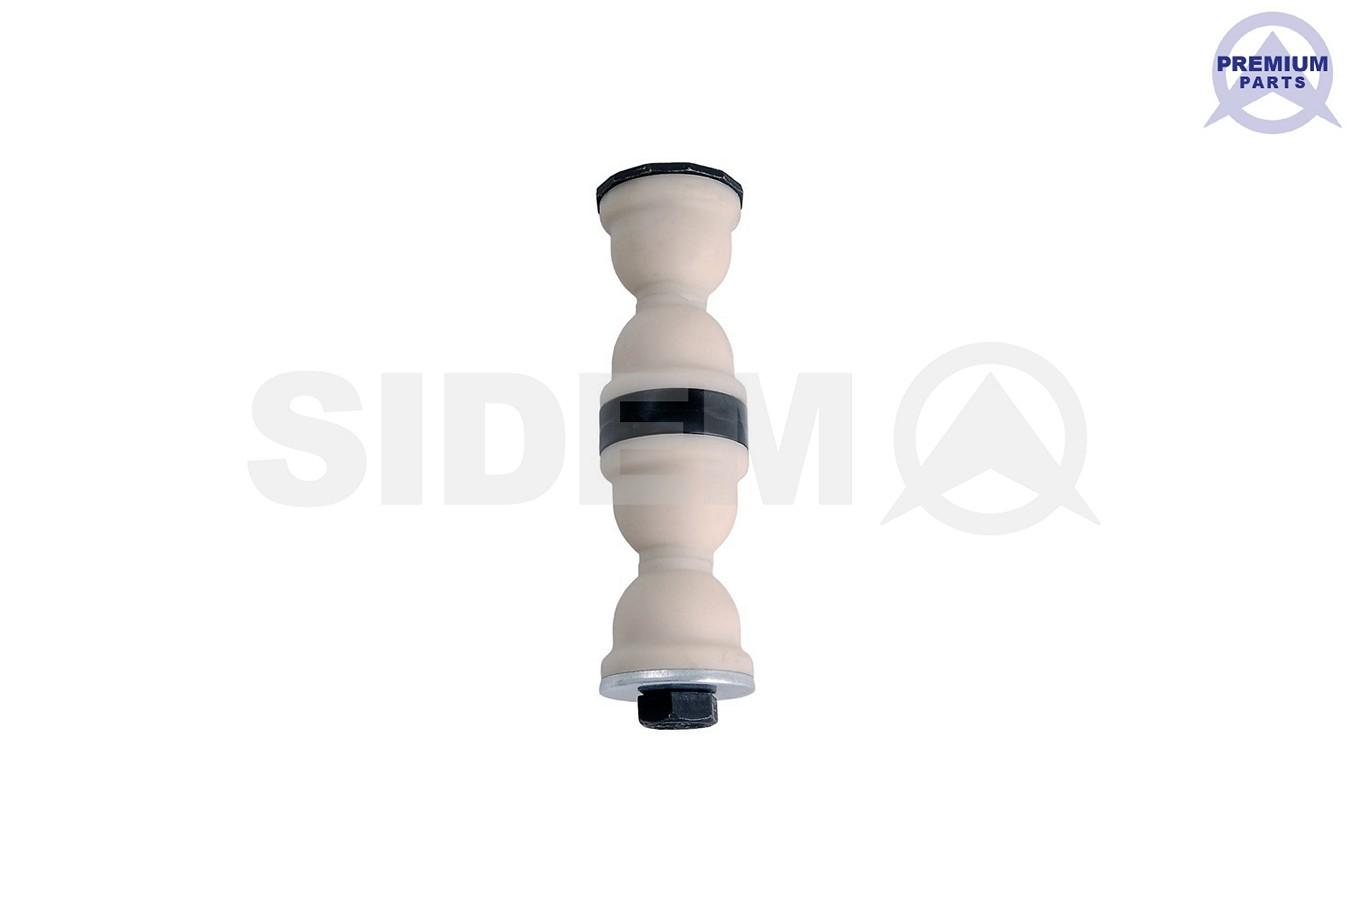 Biellette de barre stabilisatrice SIDEM 91068 (X1)